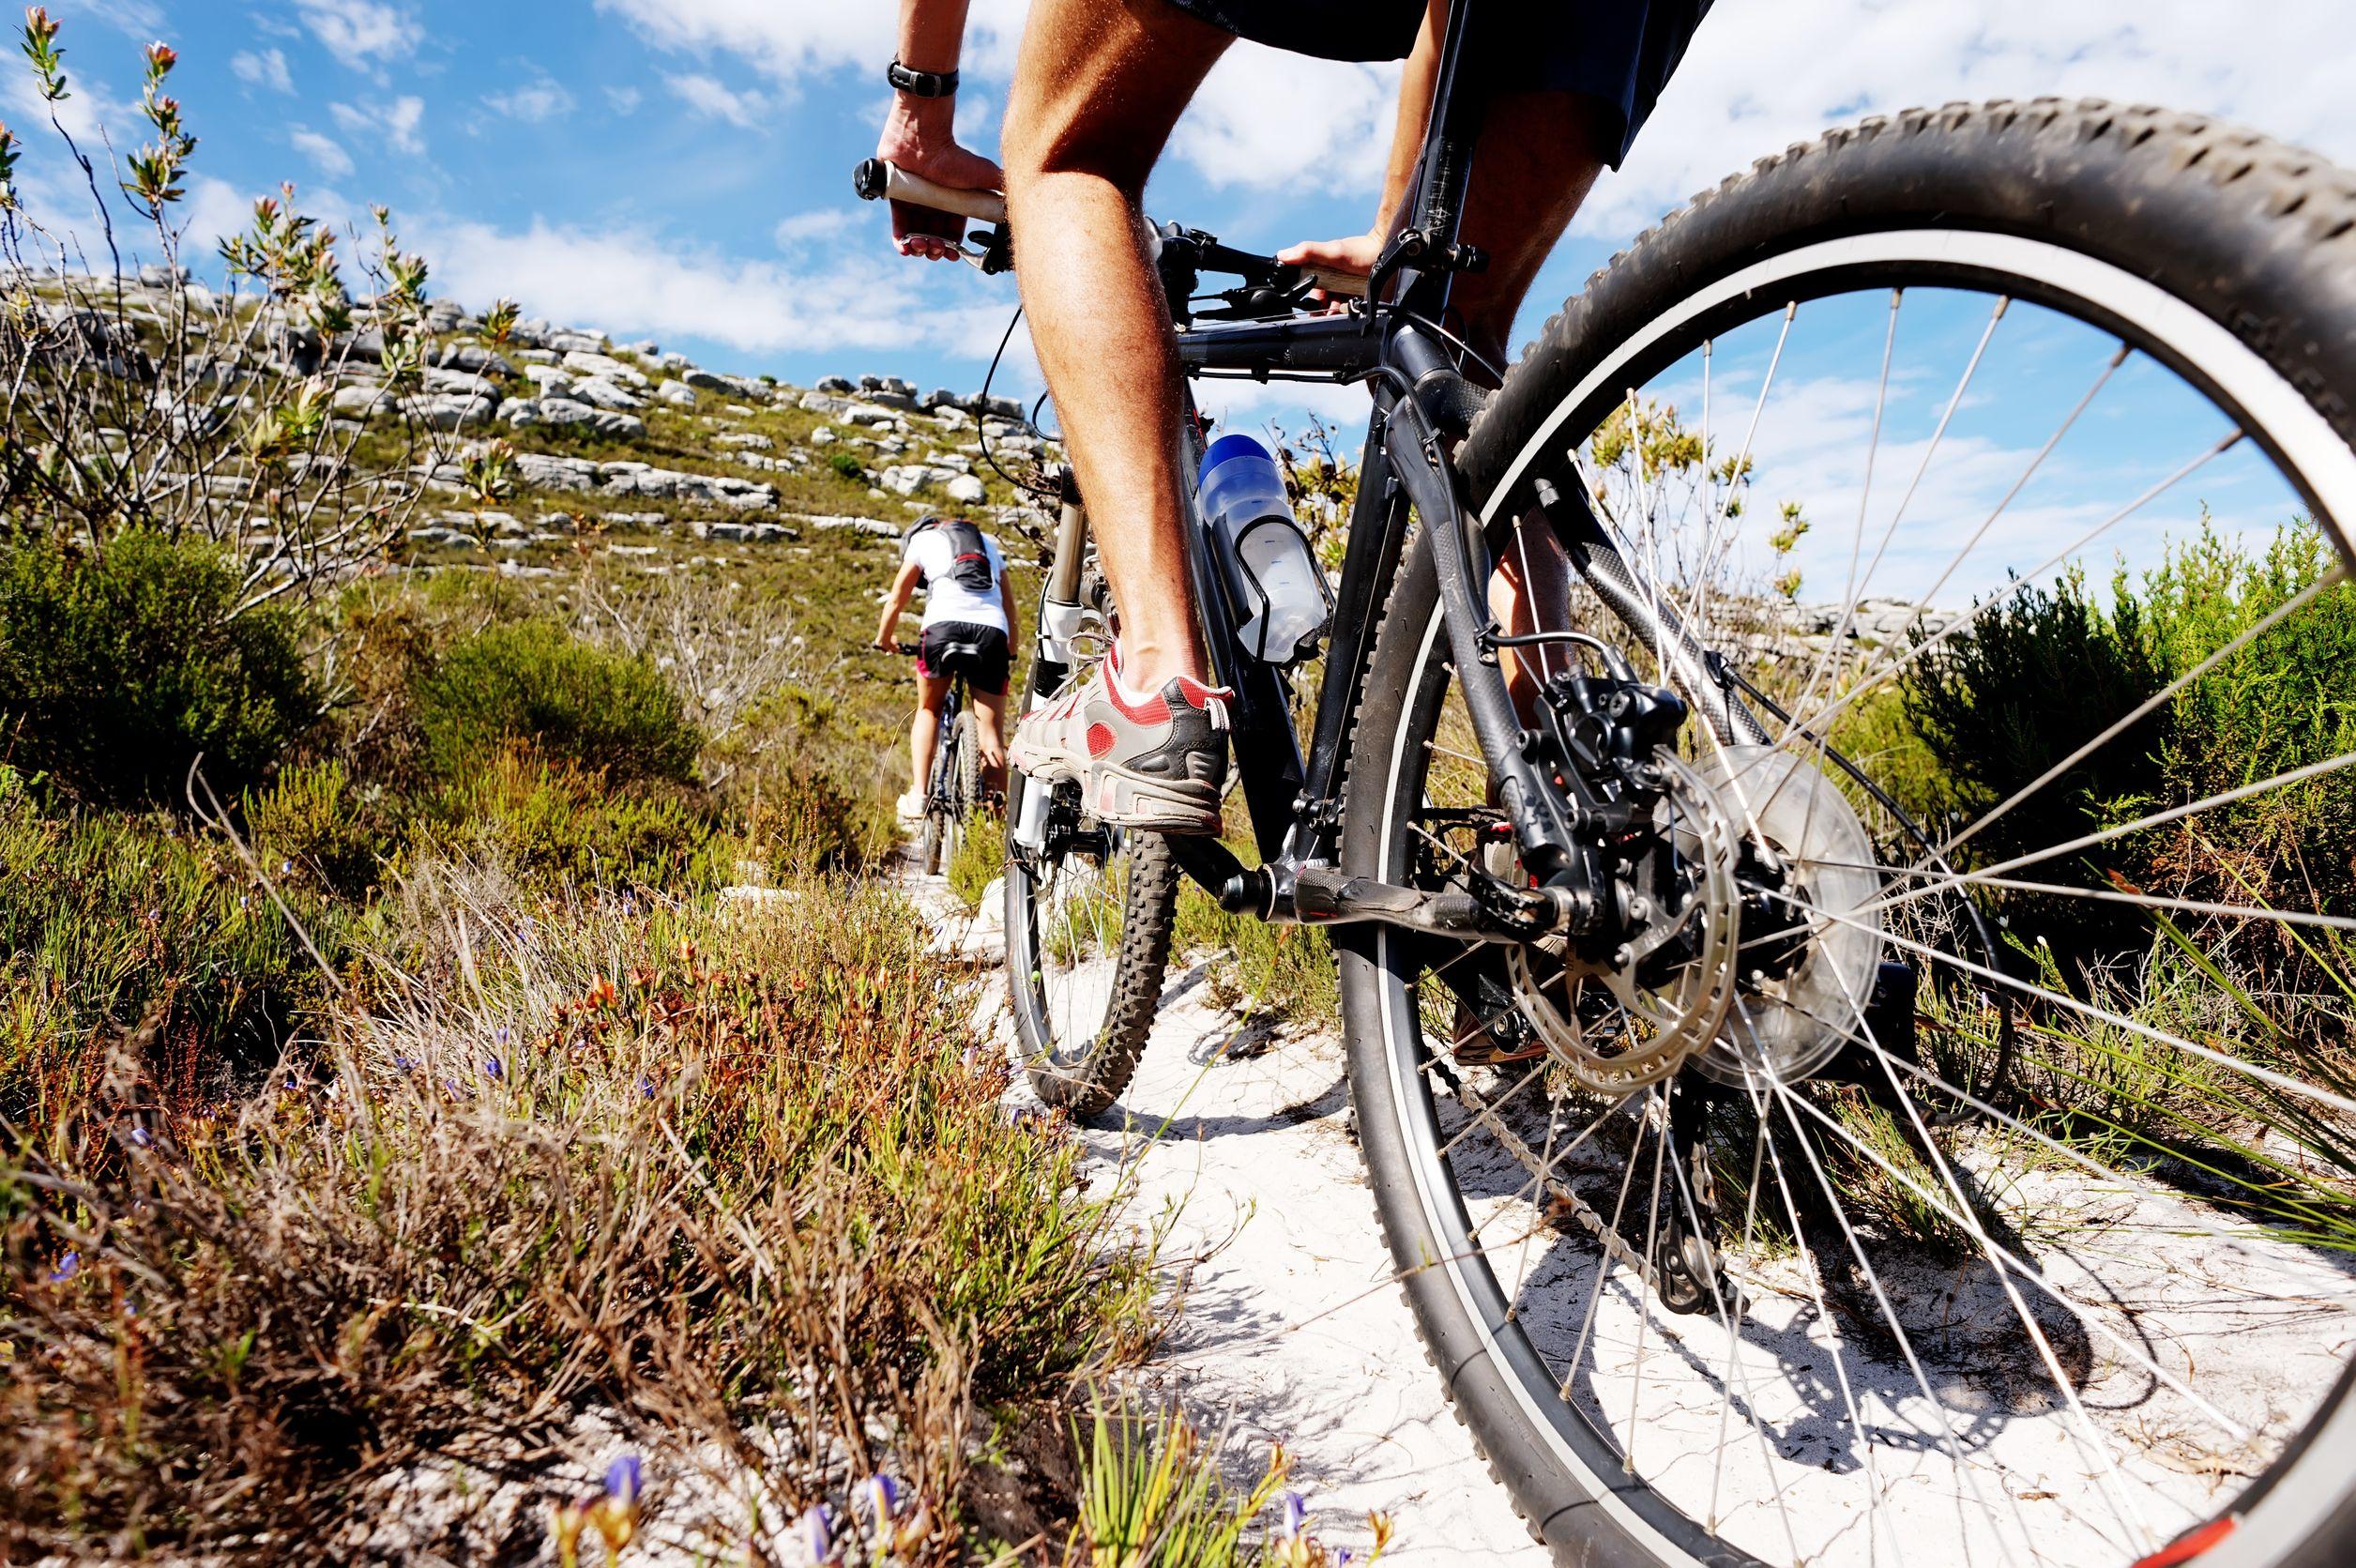 bike-path-wheels-australia